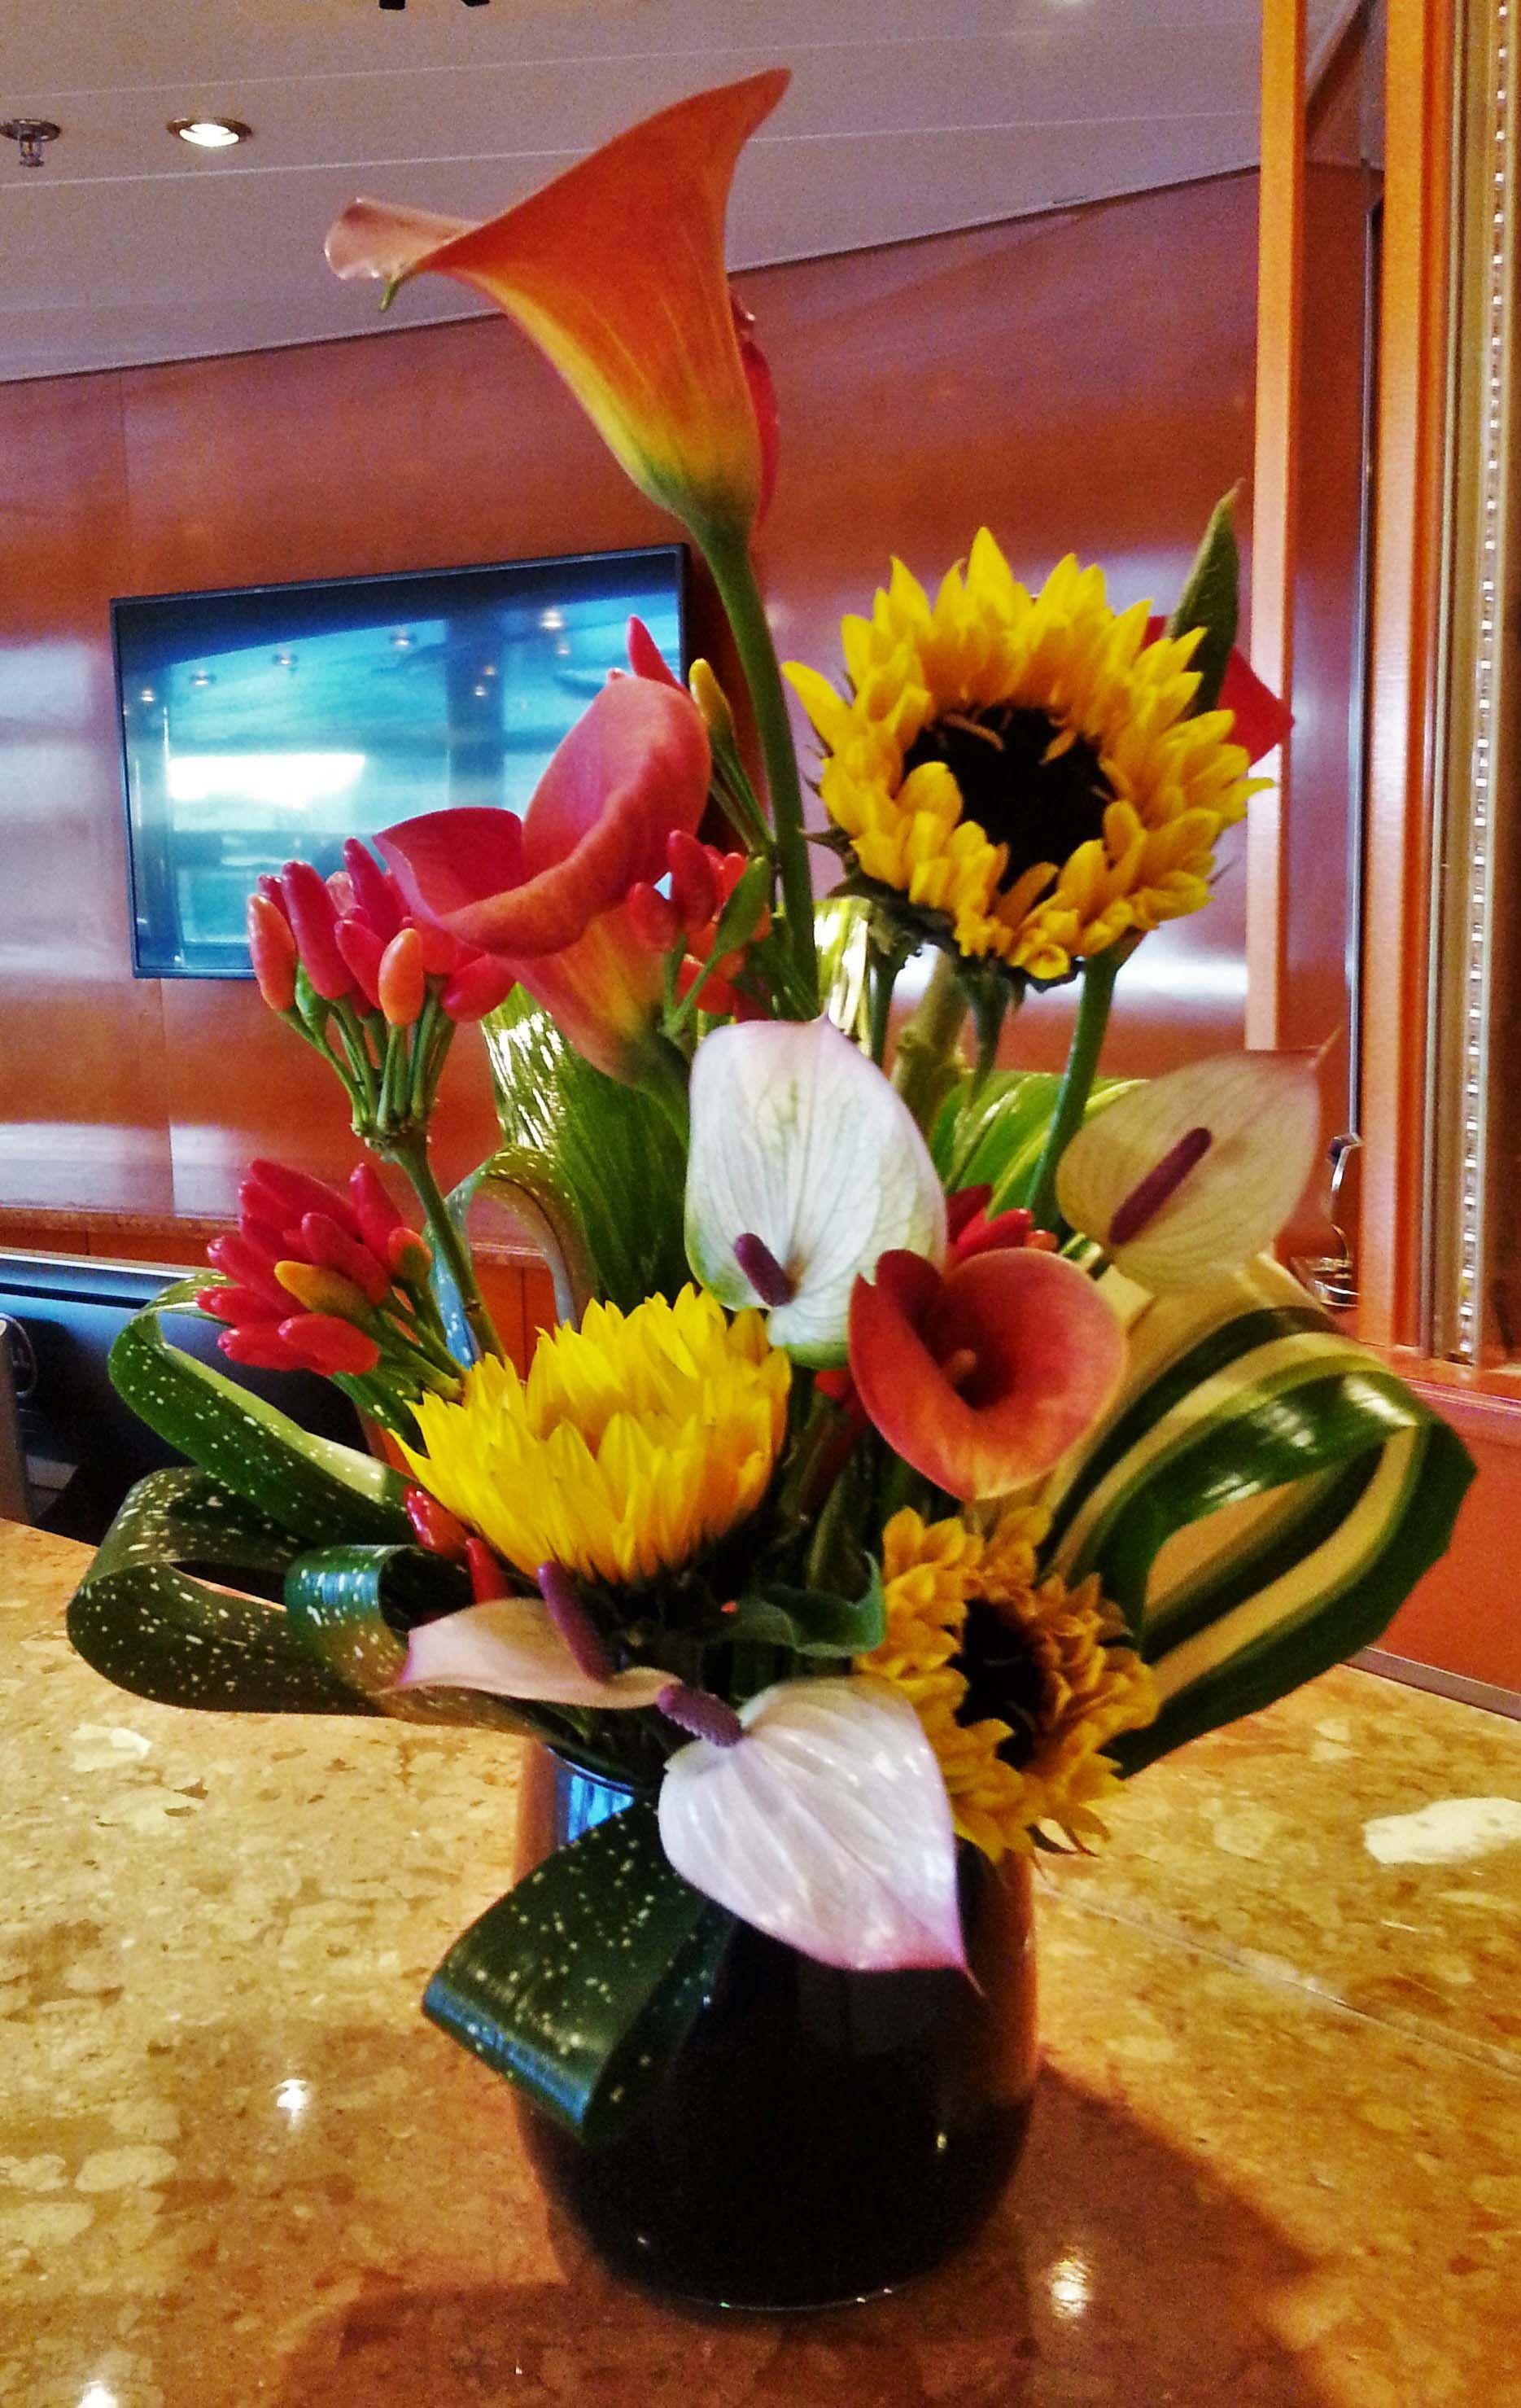 chandelier vase centerpiece of 21 flower arrangement in vase the weekly world for 3 od sunflower orange calla lily pink anthurium chilli peppers